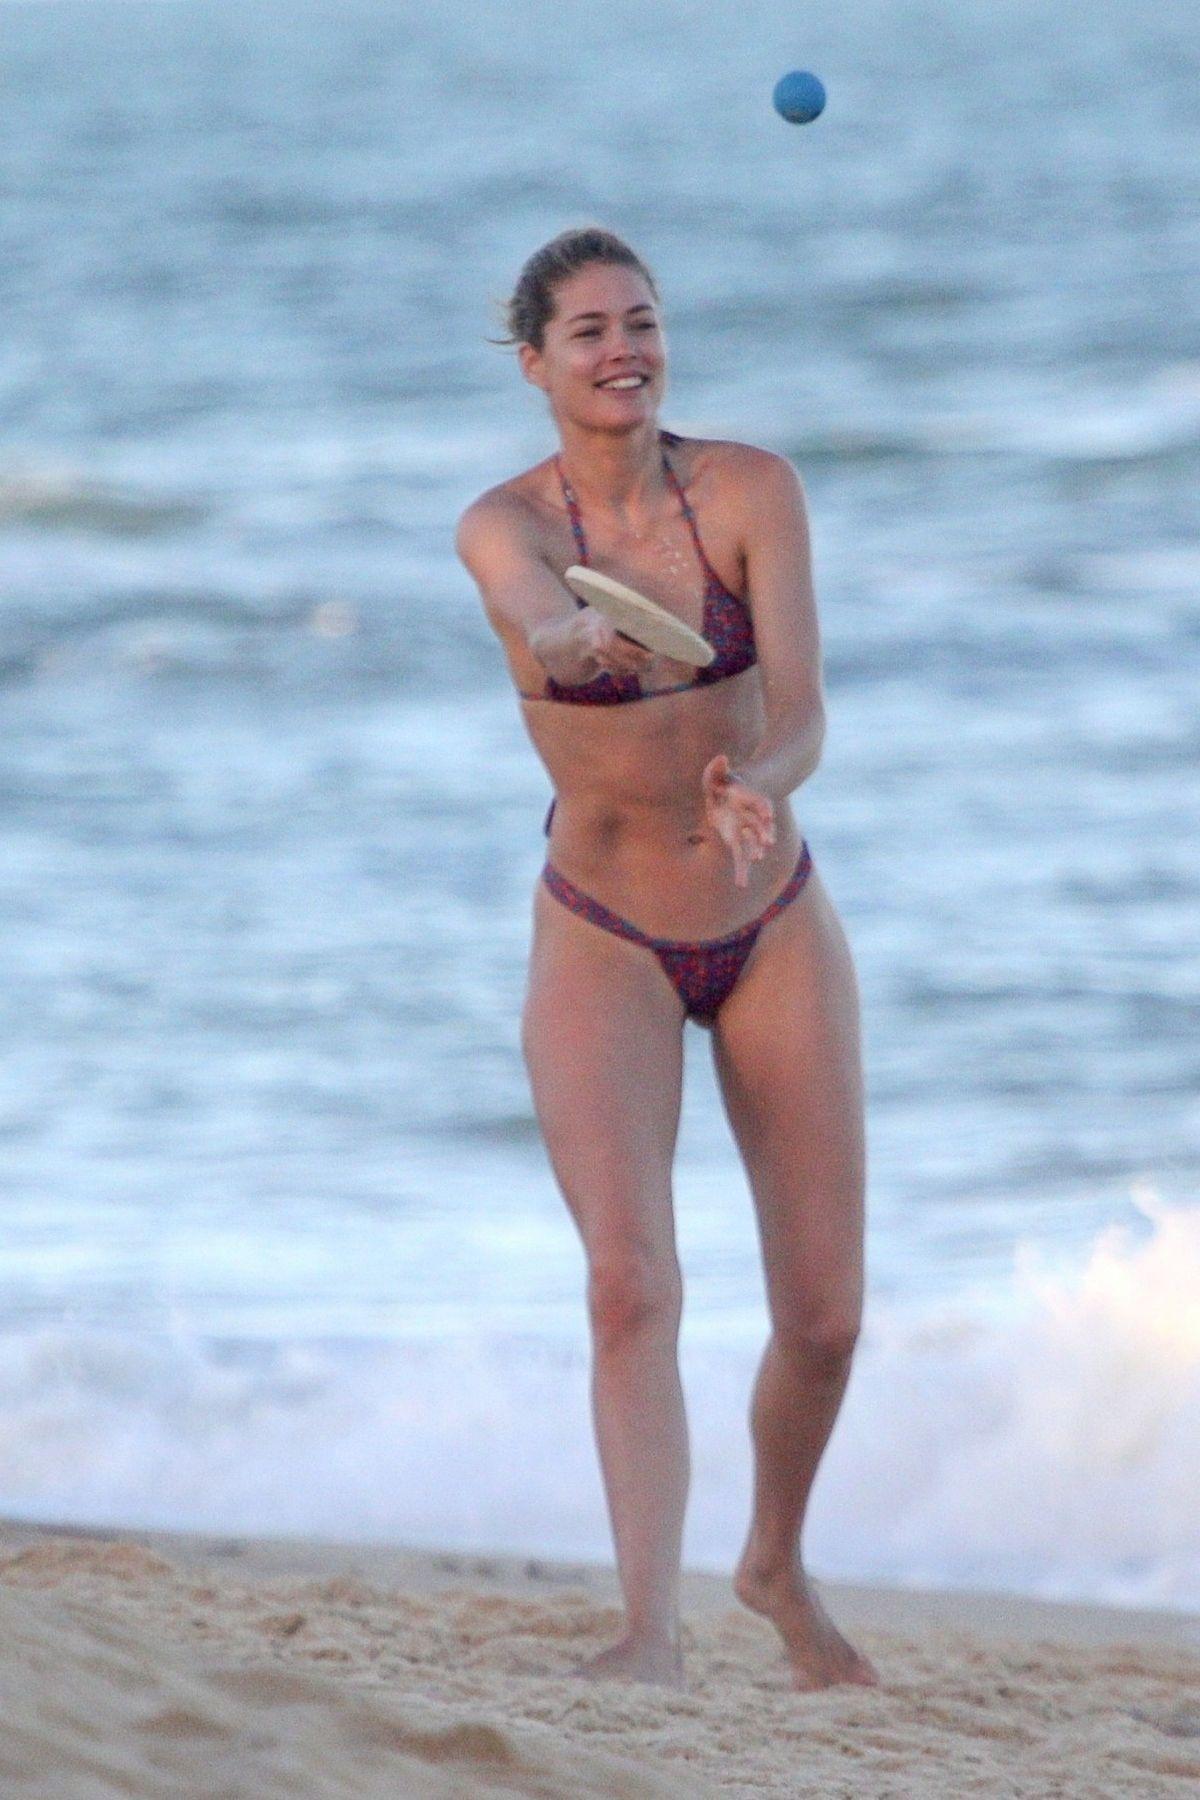 Candice Swanepoel and Doutzen Kroes in Bikini at Espelho Beach in Bahia Pic 4 of 35